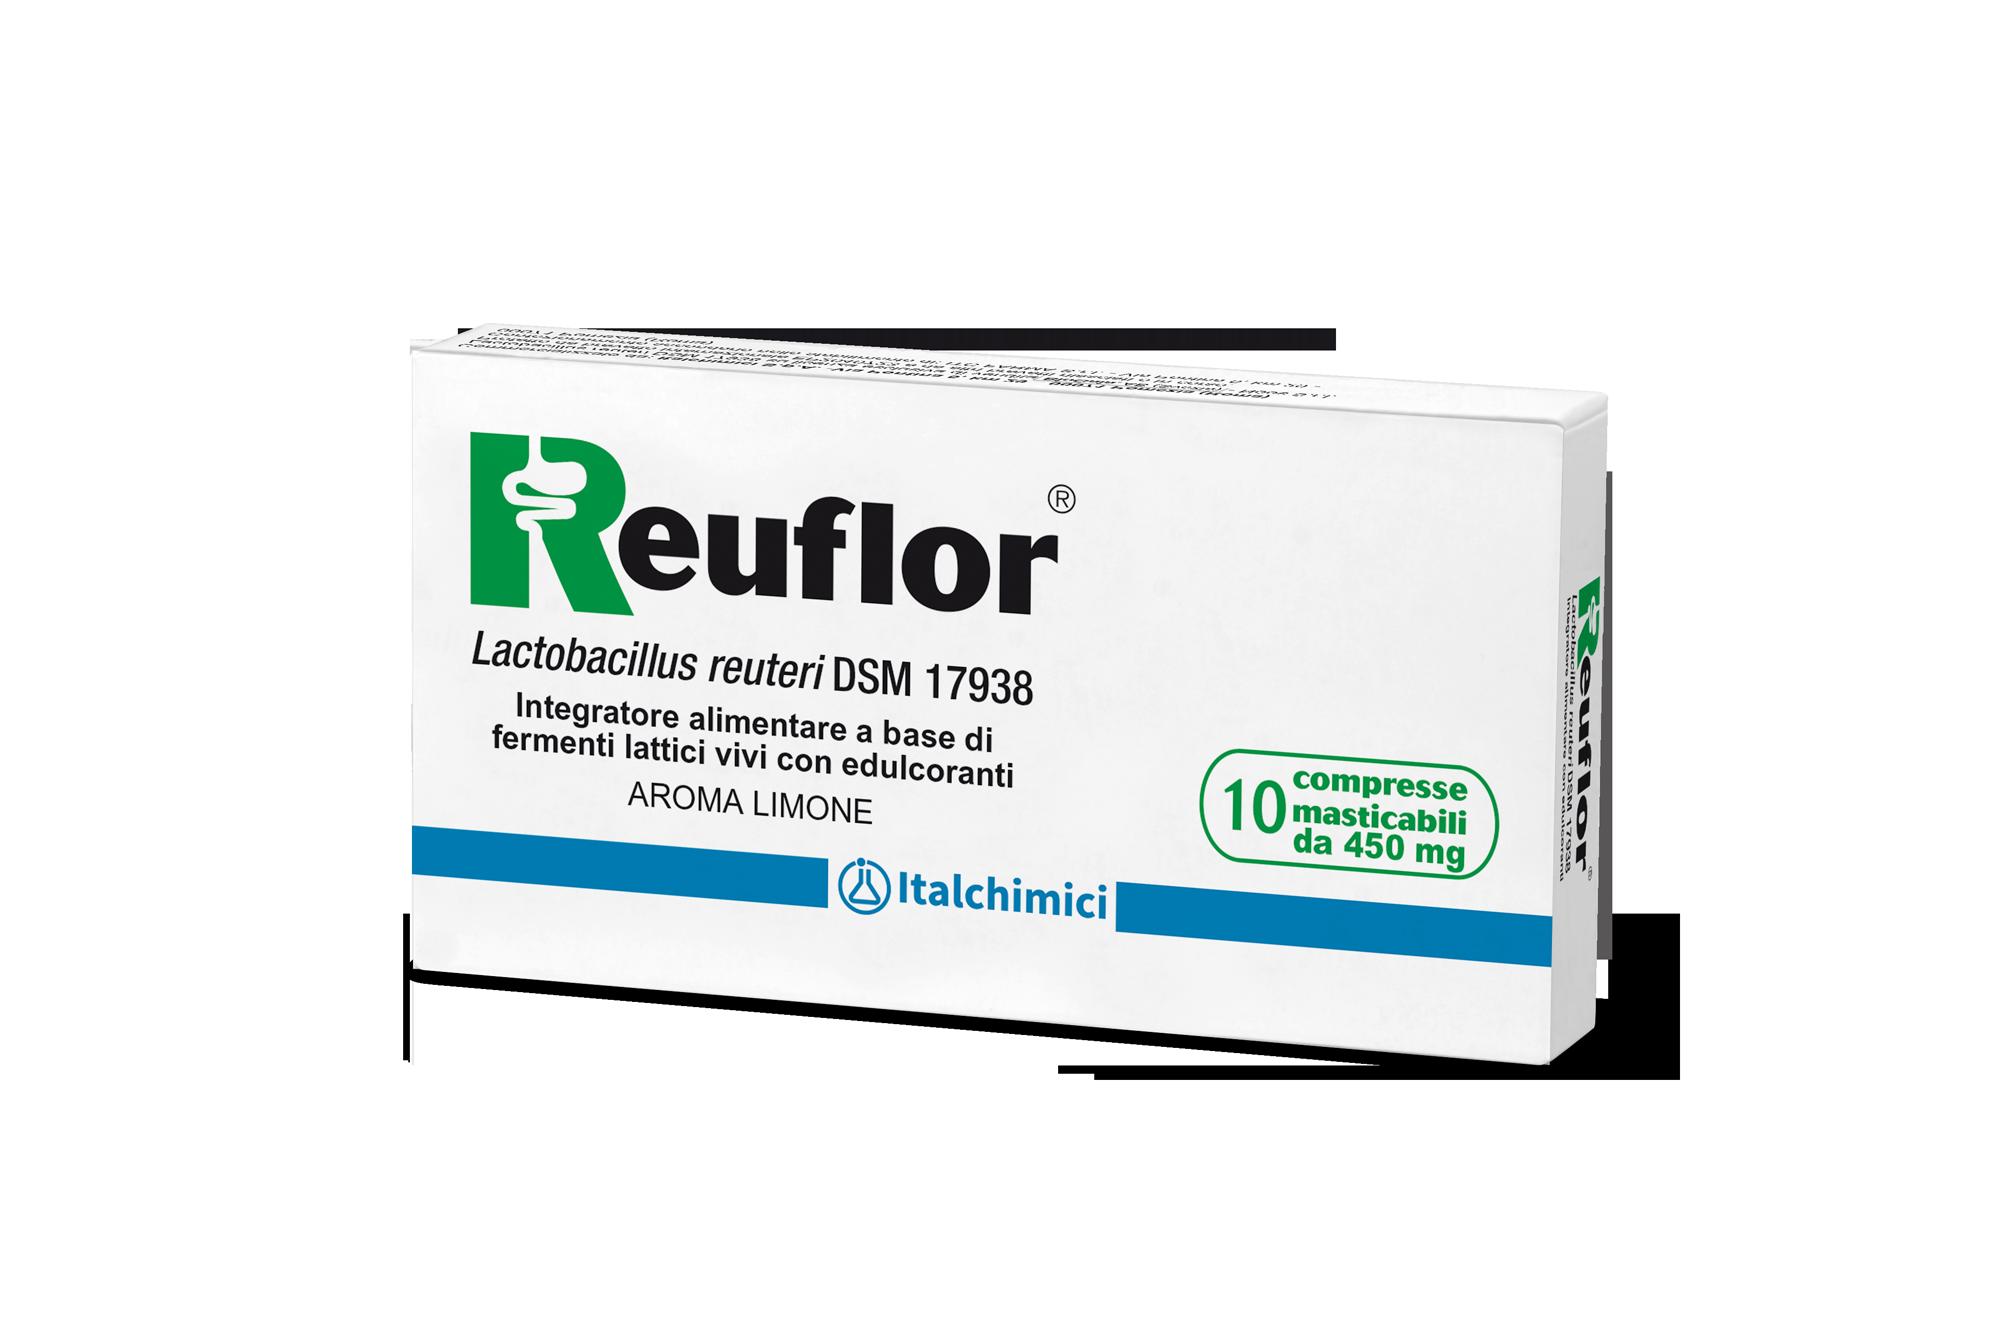 Reuflor pastiglie 10